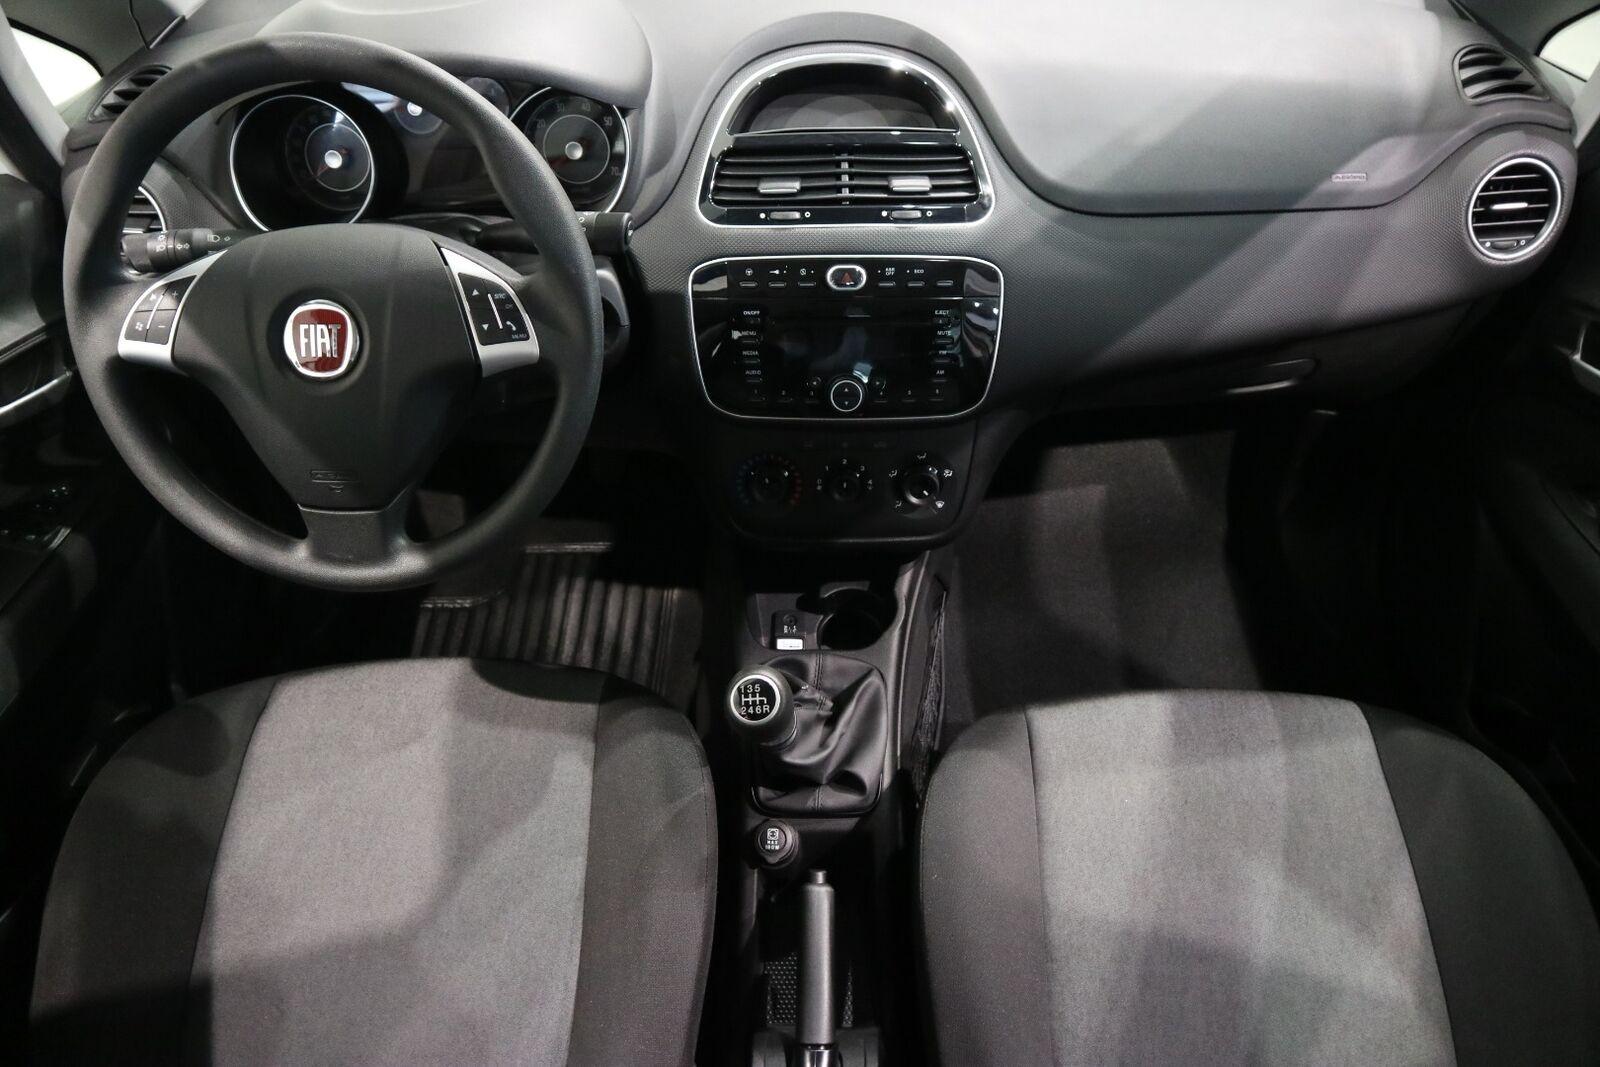 Fiat Punto 0,9 TwinAir 85 - billede 10